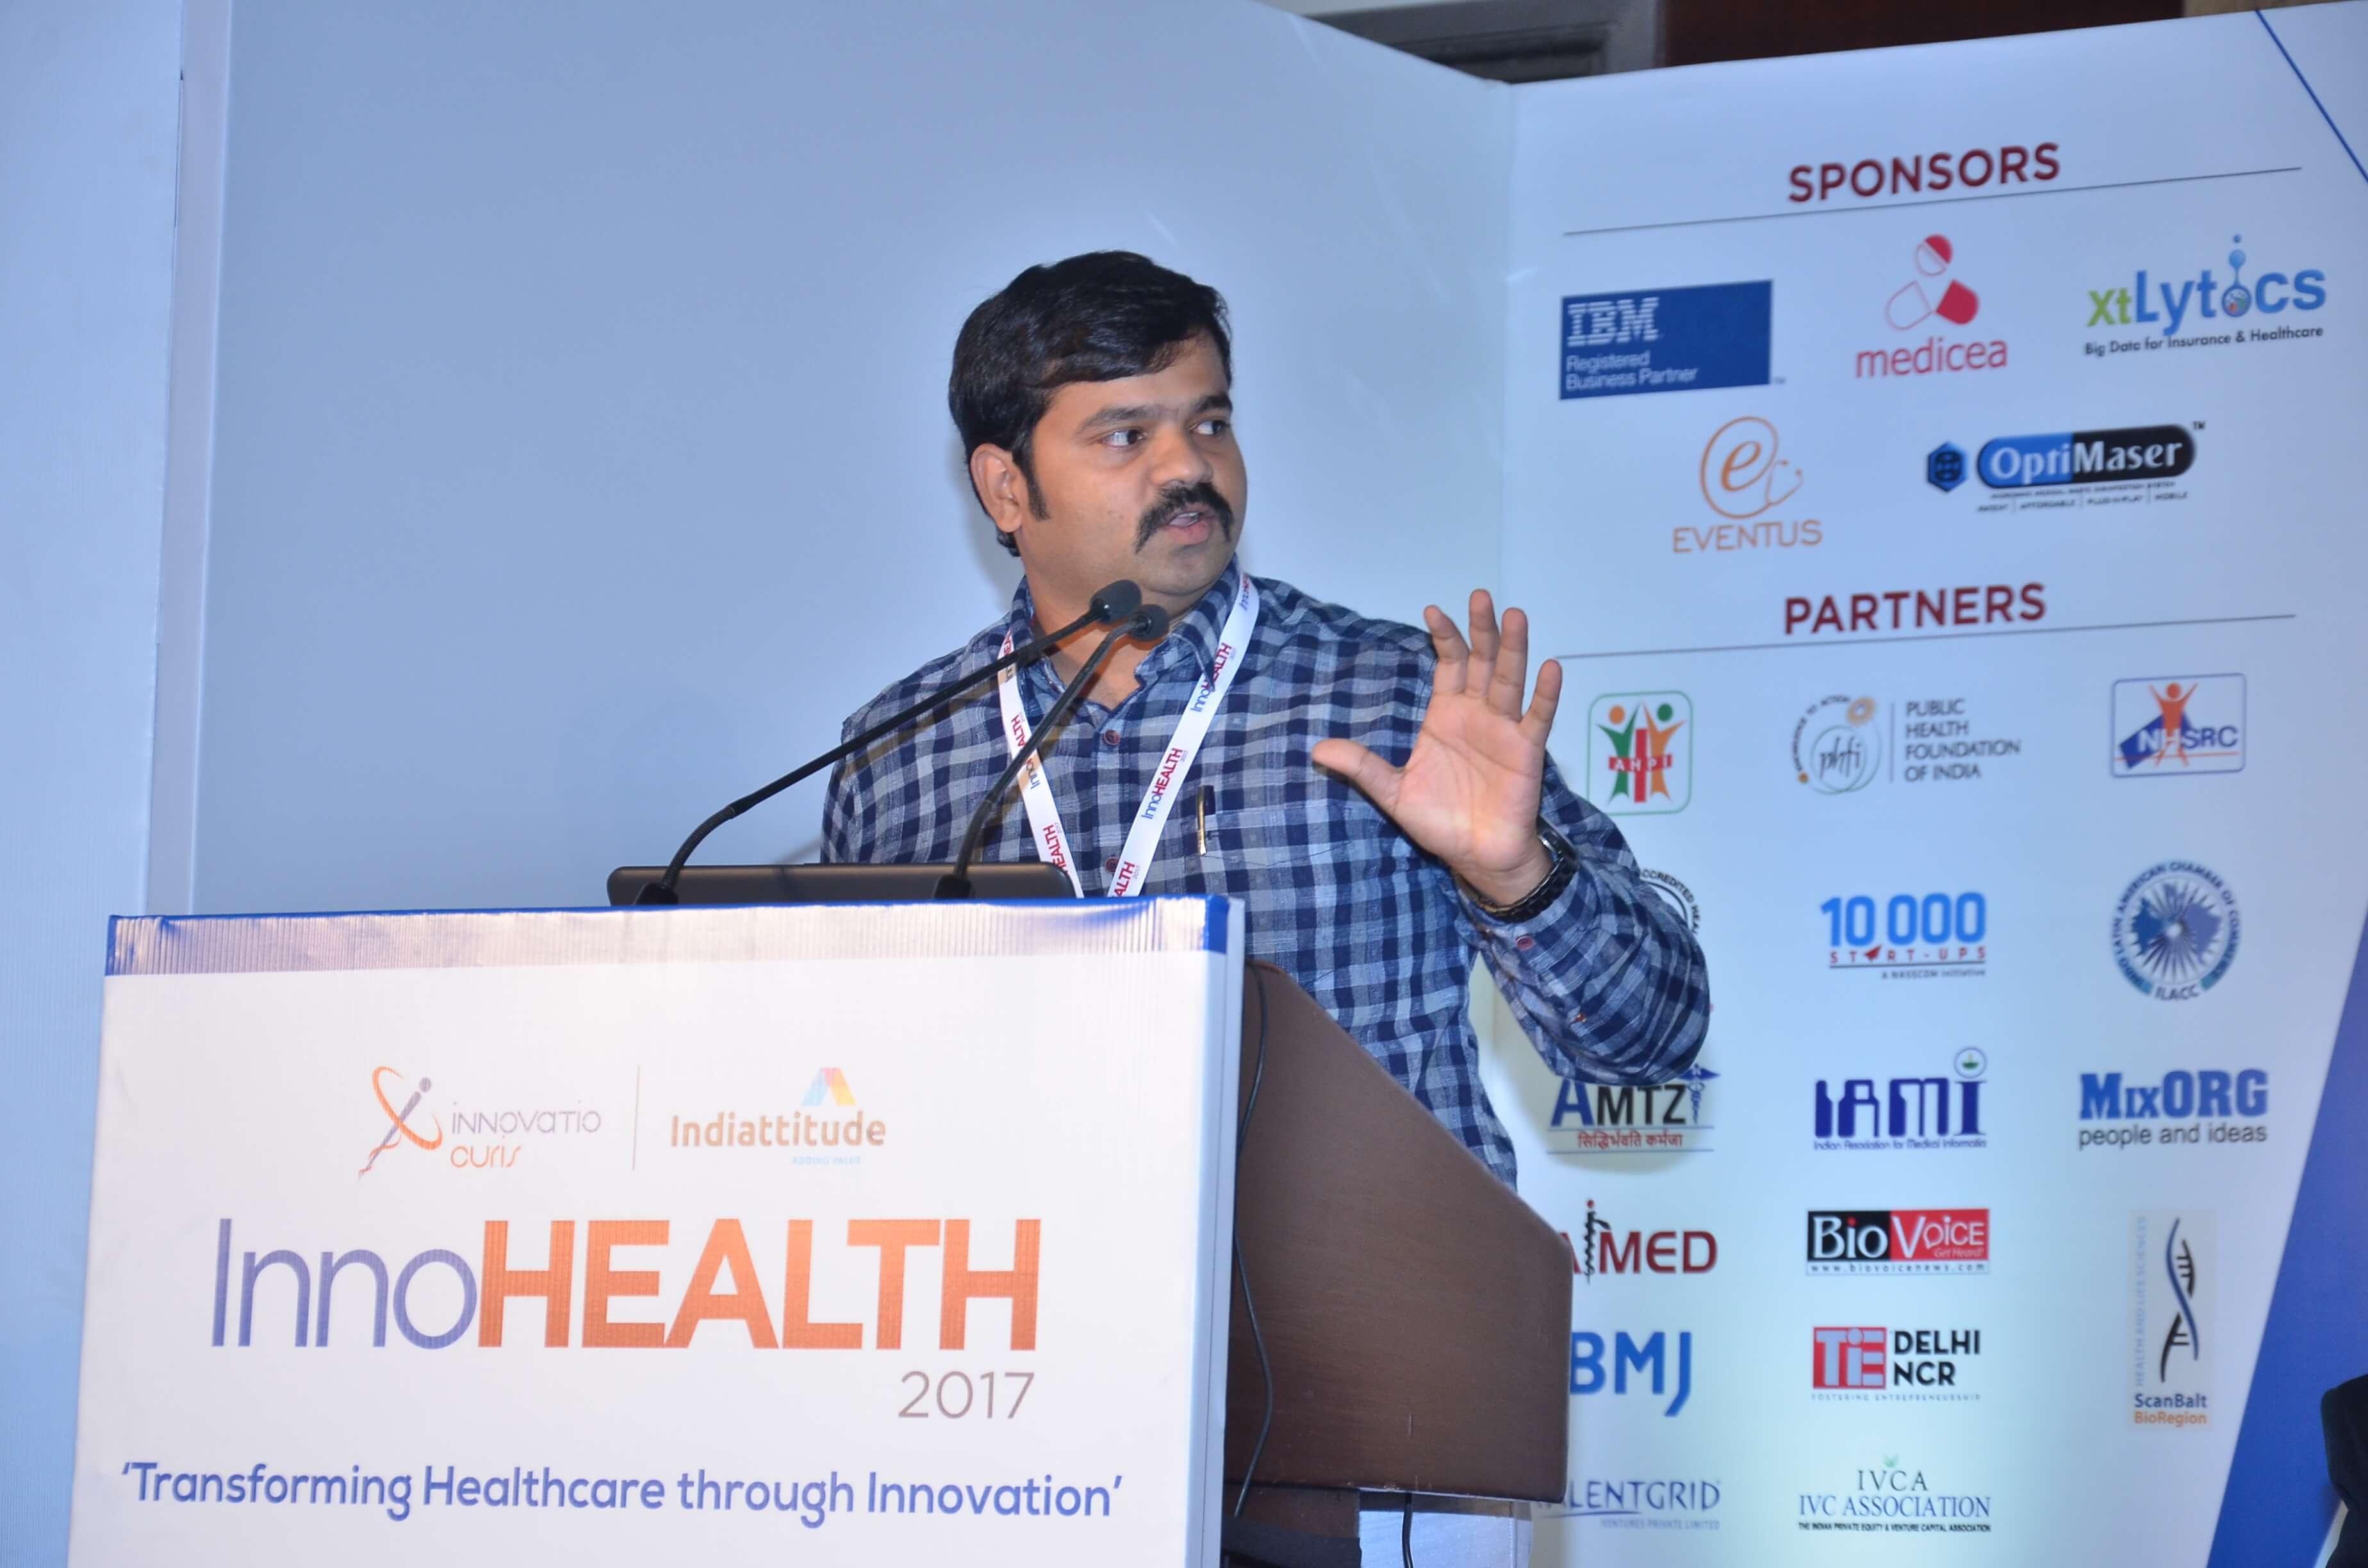 Sri Harsha presenting his innovation at InnoHEALTH 2017